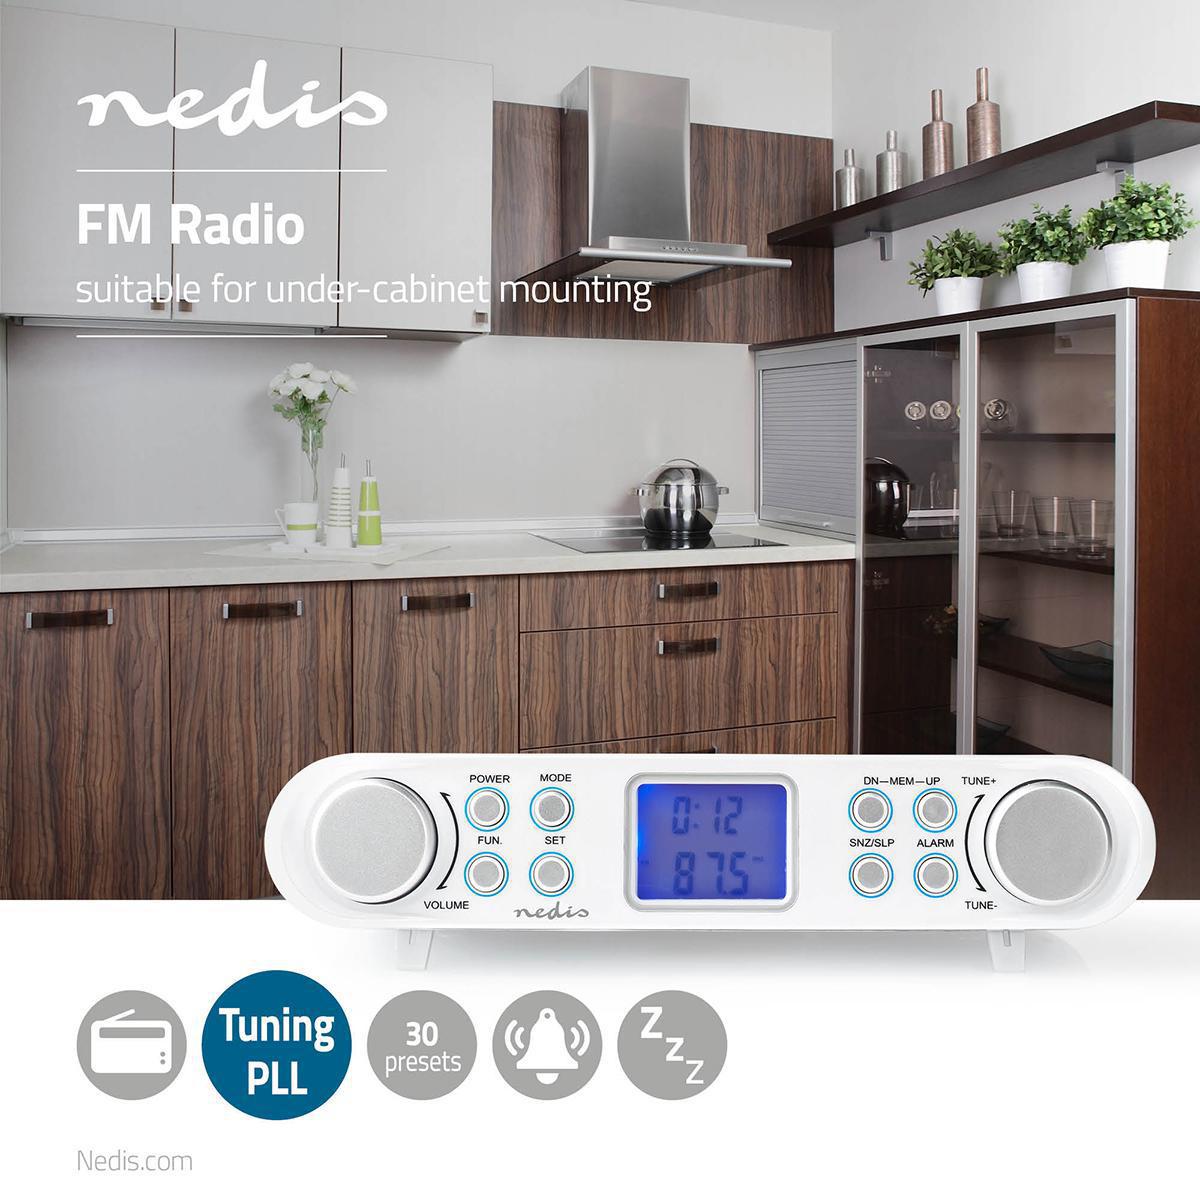 fm radio under cabinet radio 30